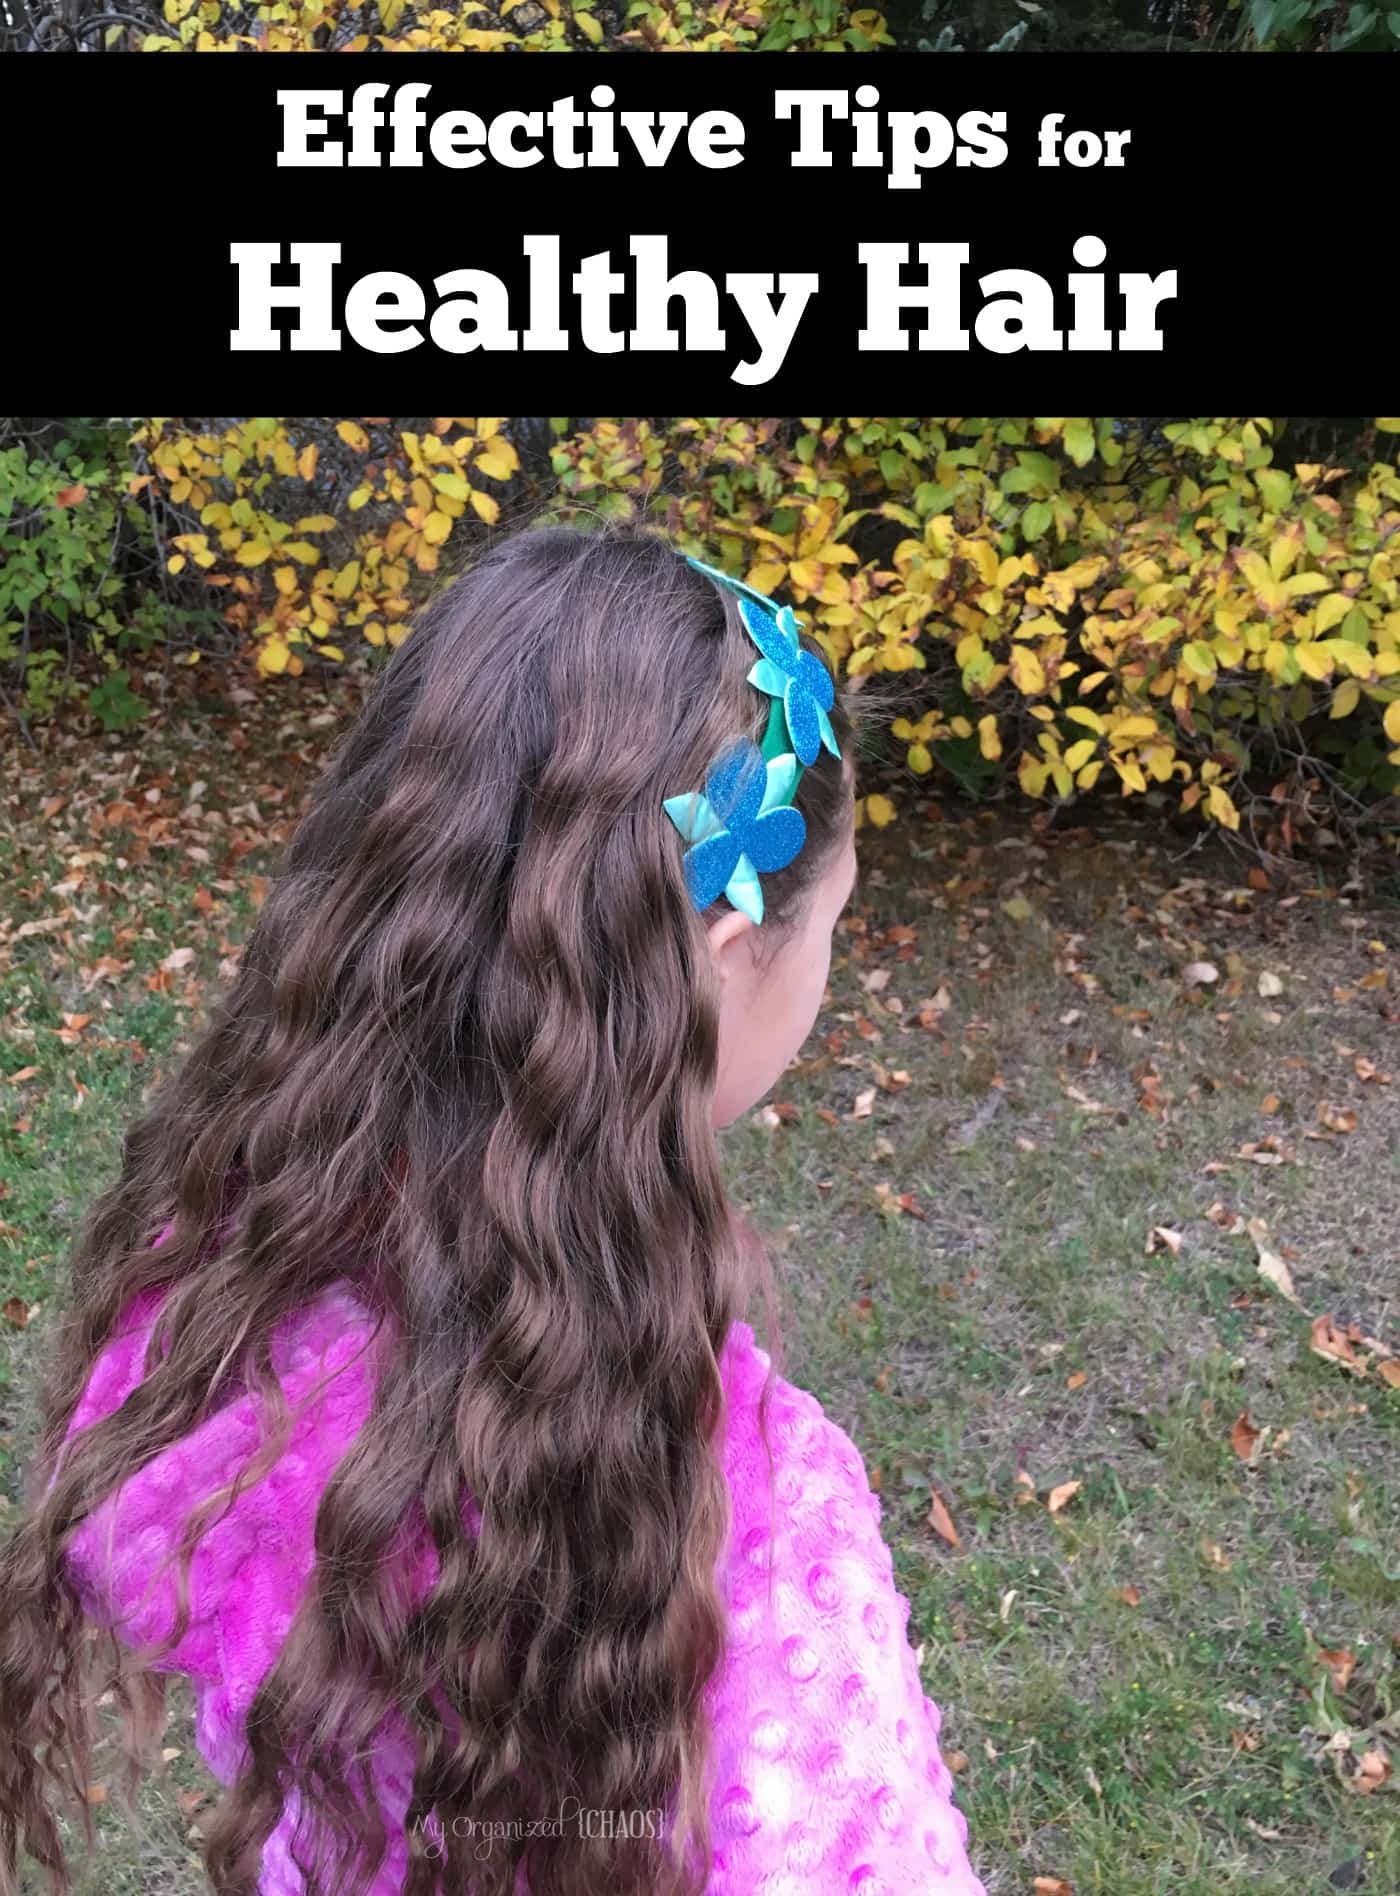 Effective Tips for Healthy Hair this fall season